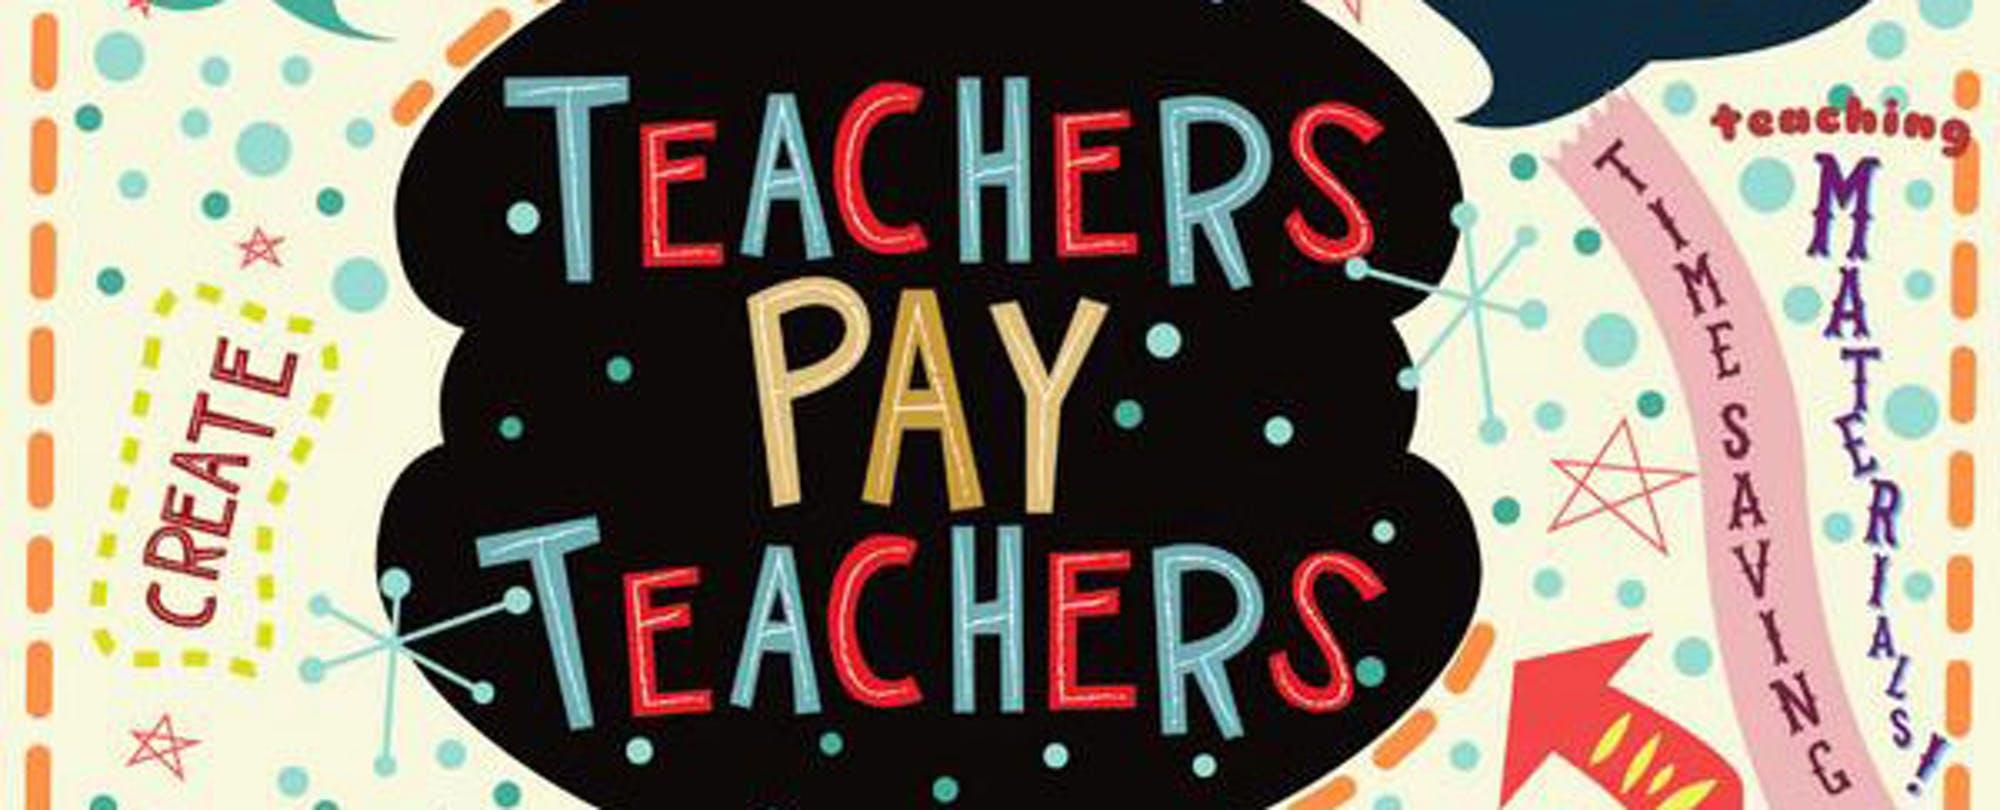 Former Etsy COO Joins TeachersPayTeachers as New CEO